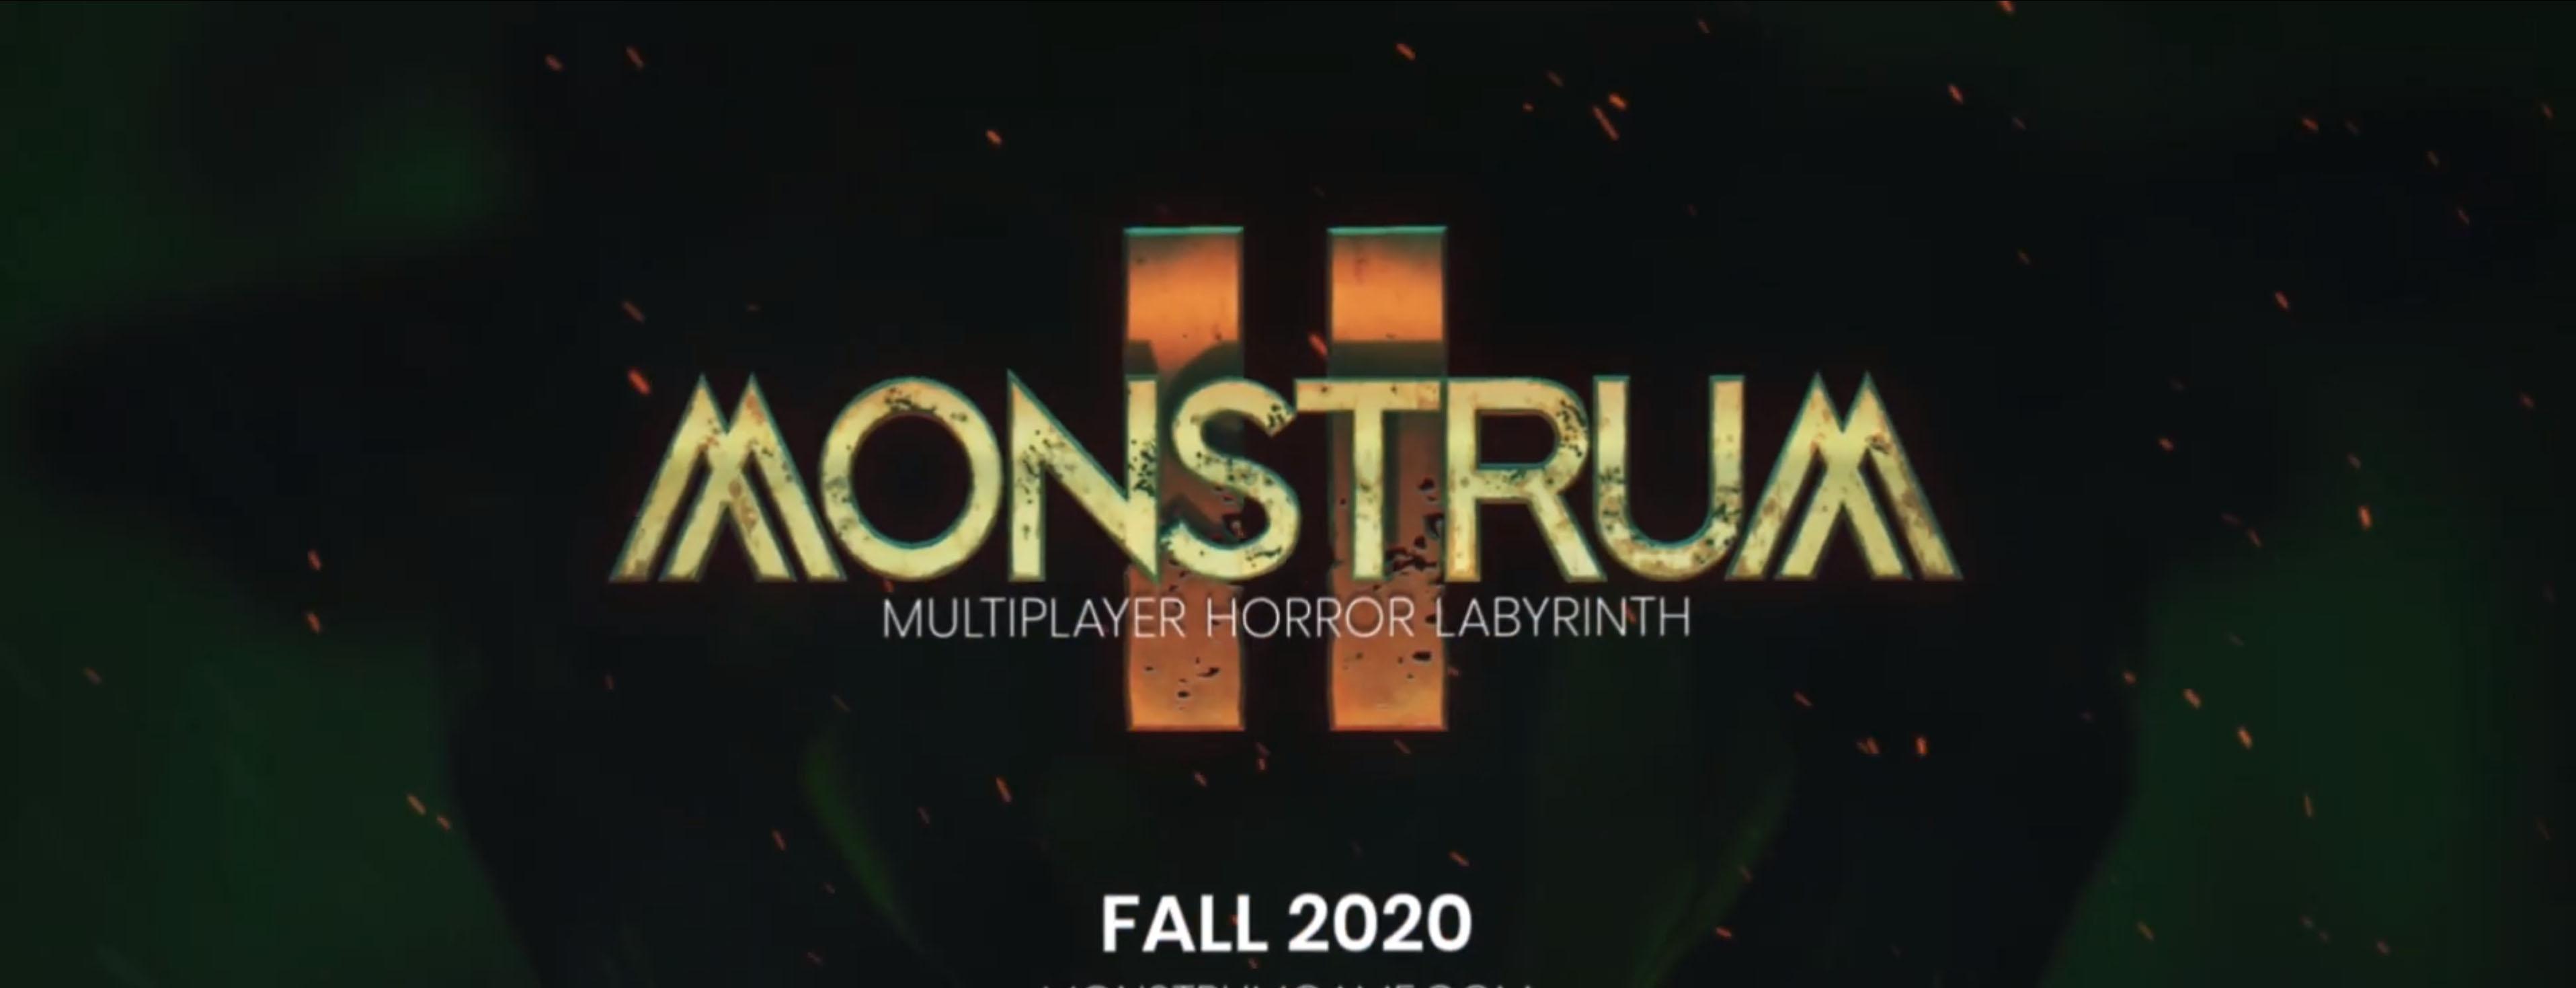 Monstrum 2, Hide And Seek On The Ocean? Hunters Find Monster Reborn In This 4v1 Game